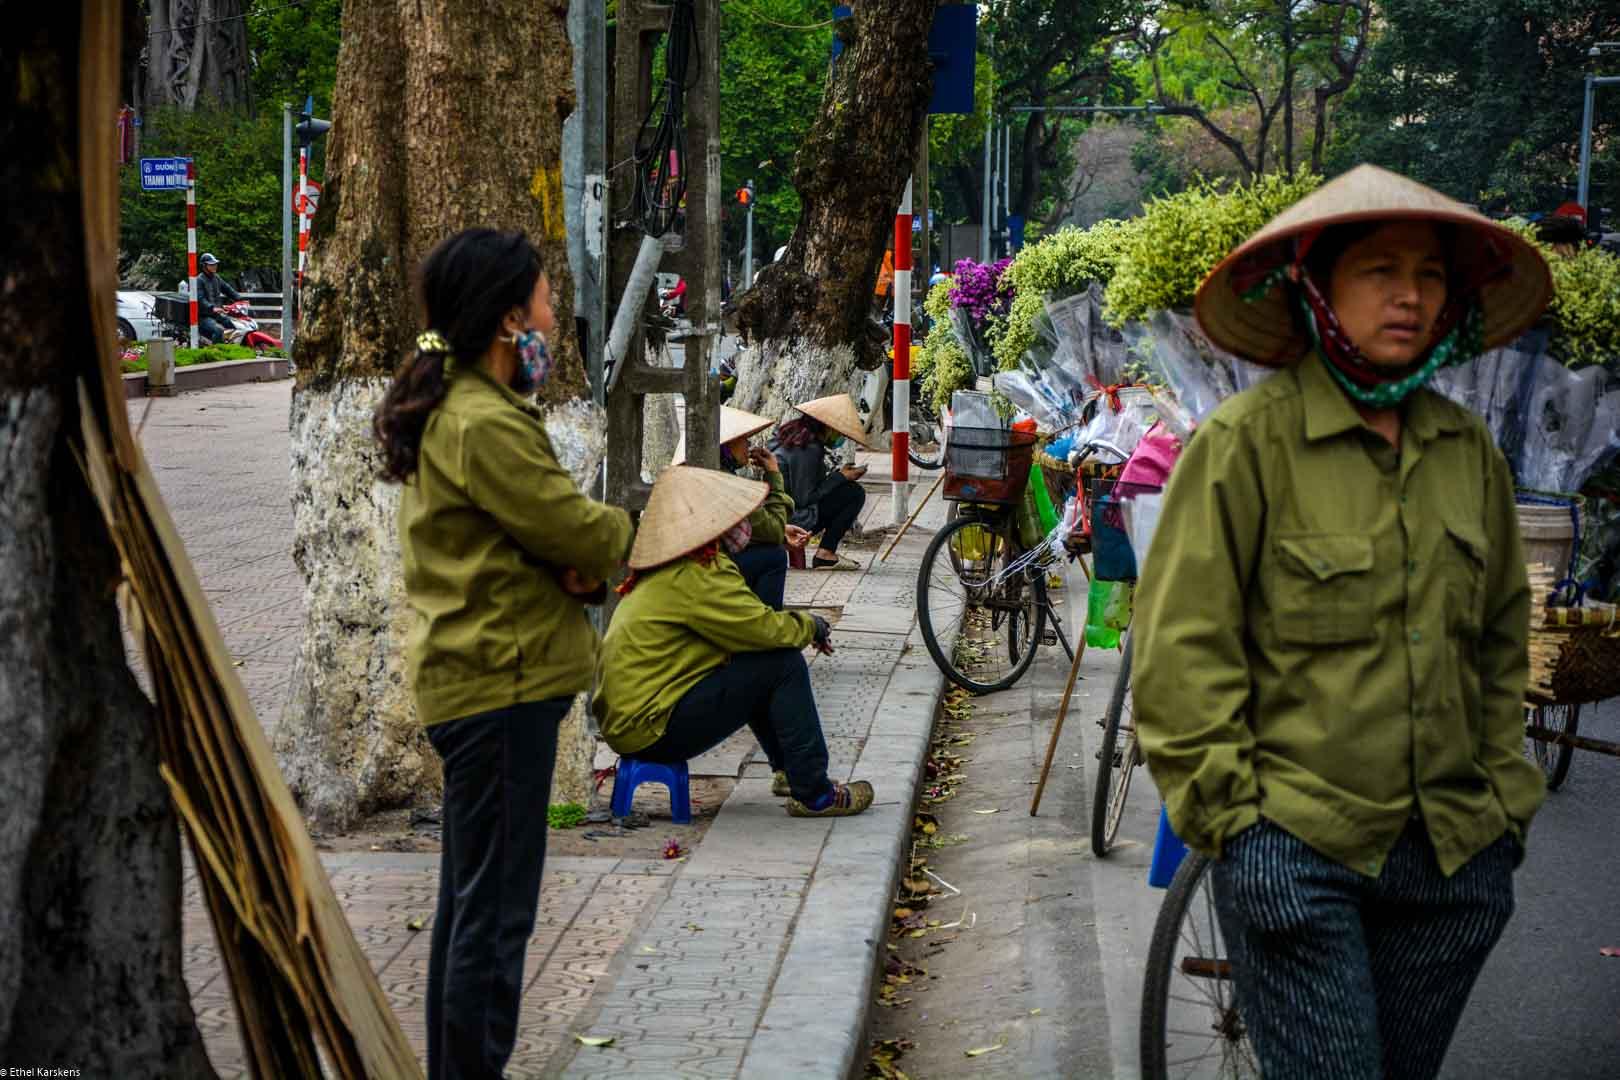 Women selling flowers in the street of Hanoi